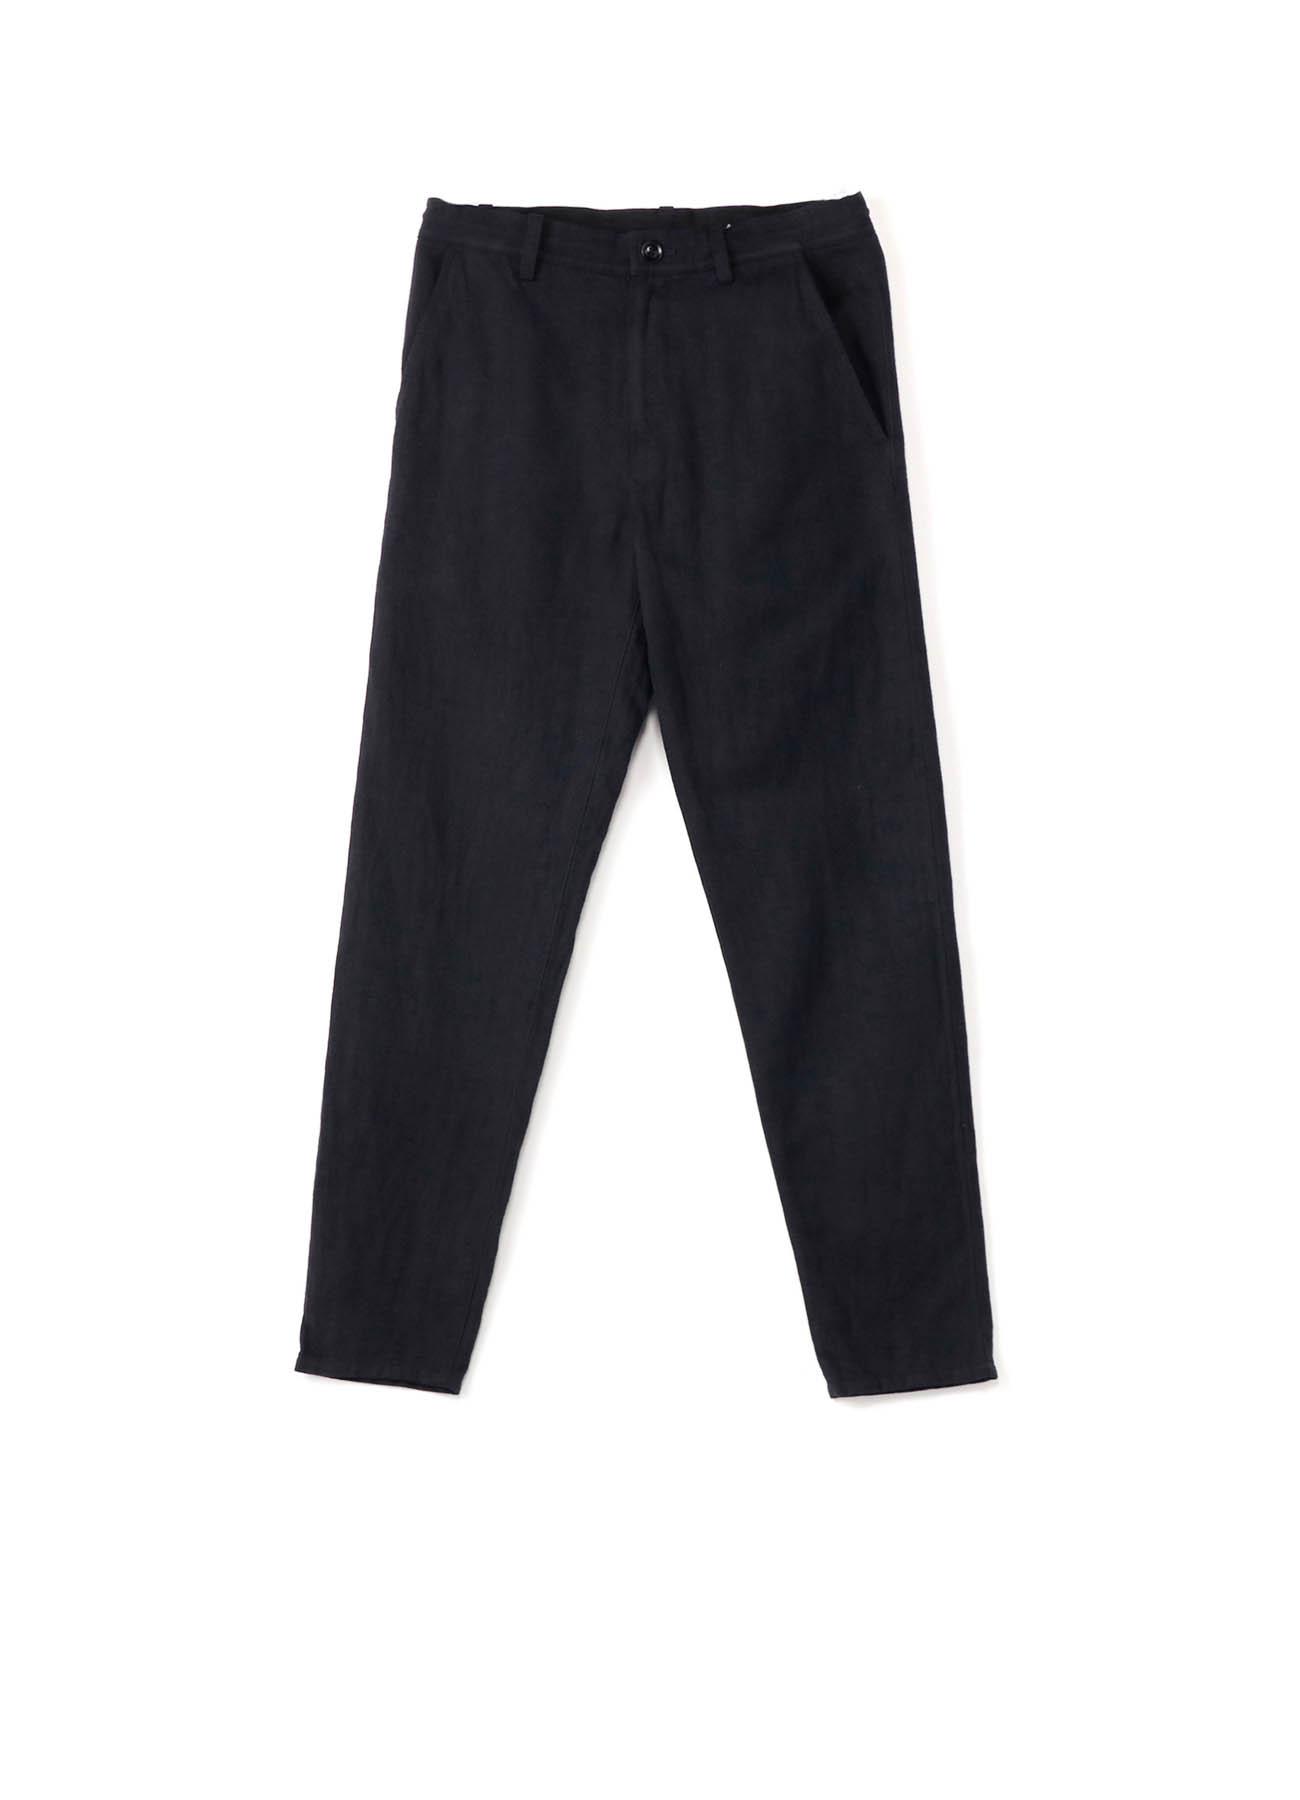 C/Li TOP LOOSE TWILL WAIST LACE SLIM PANTS